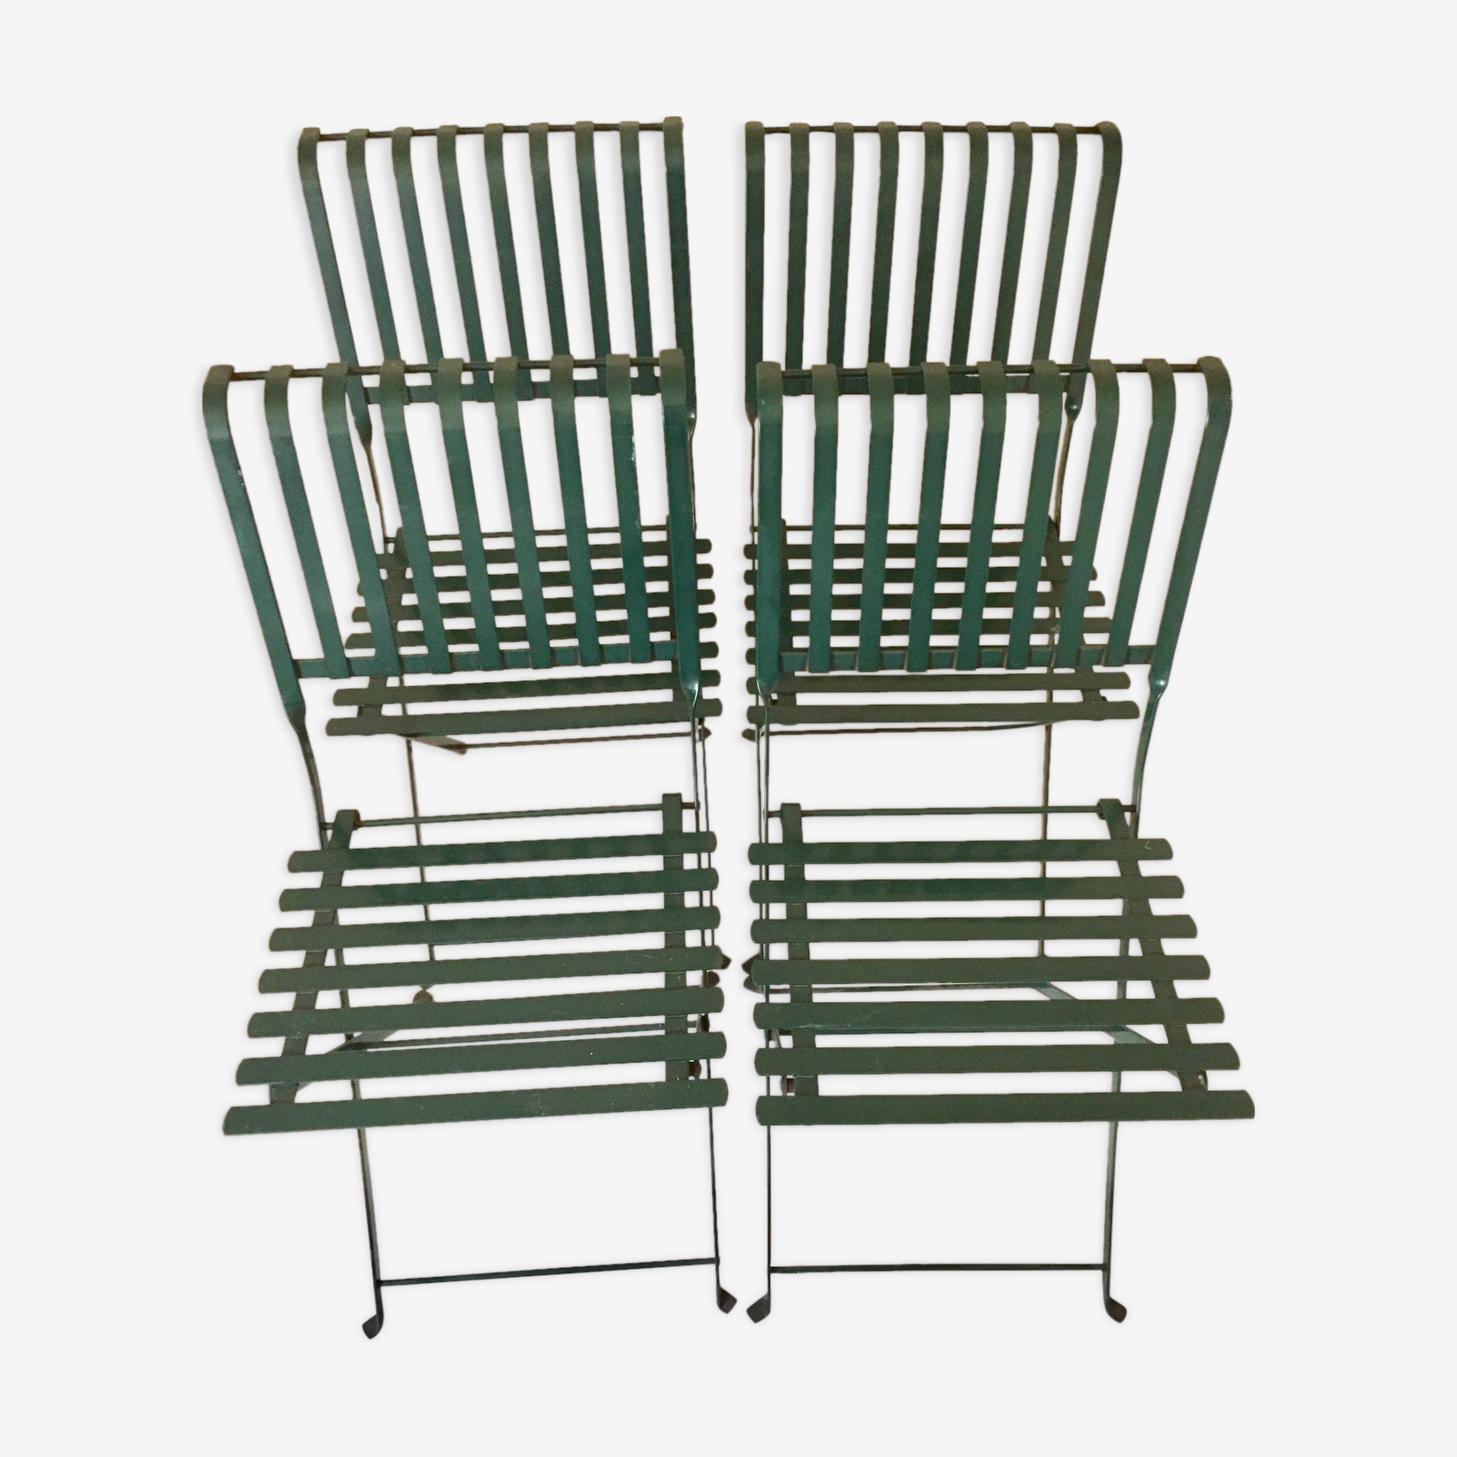 Set of 4 metal folding garden chairs